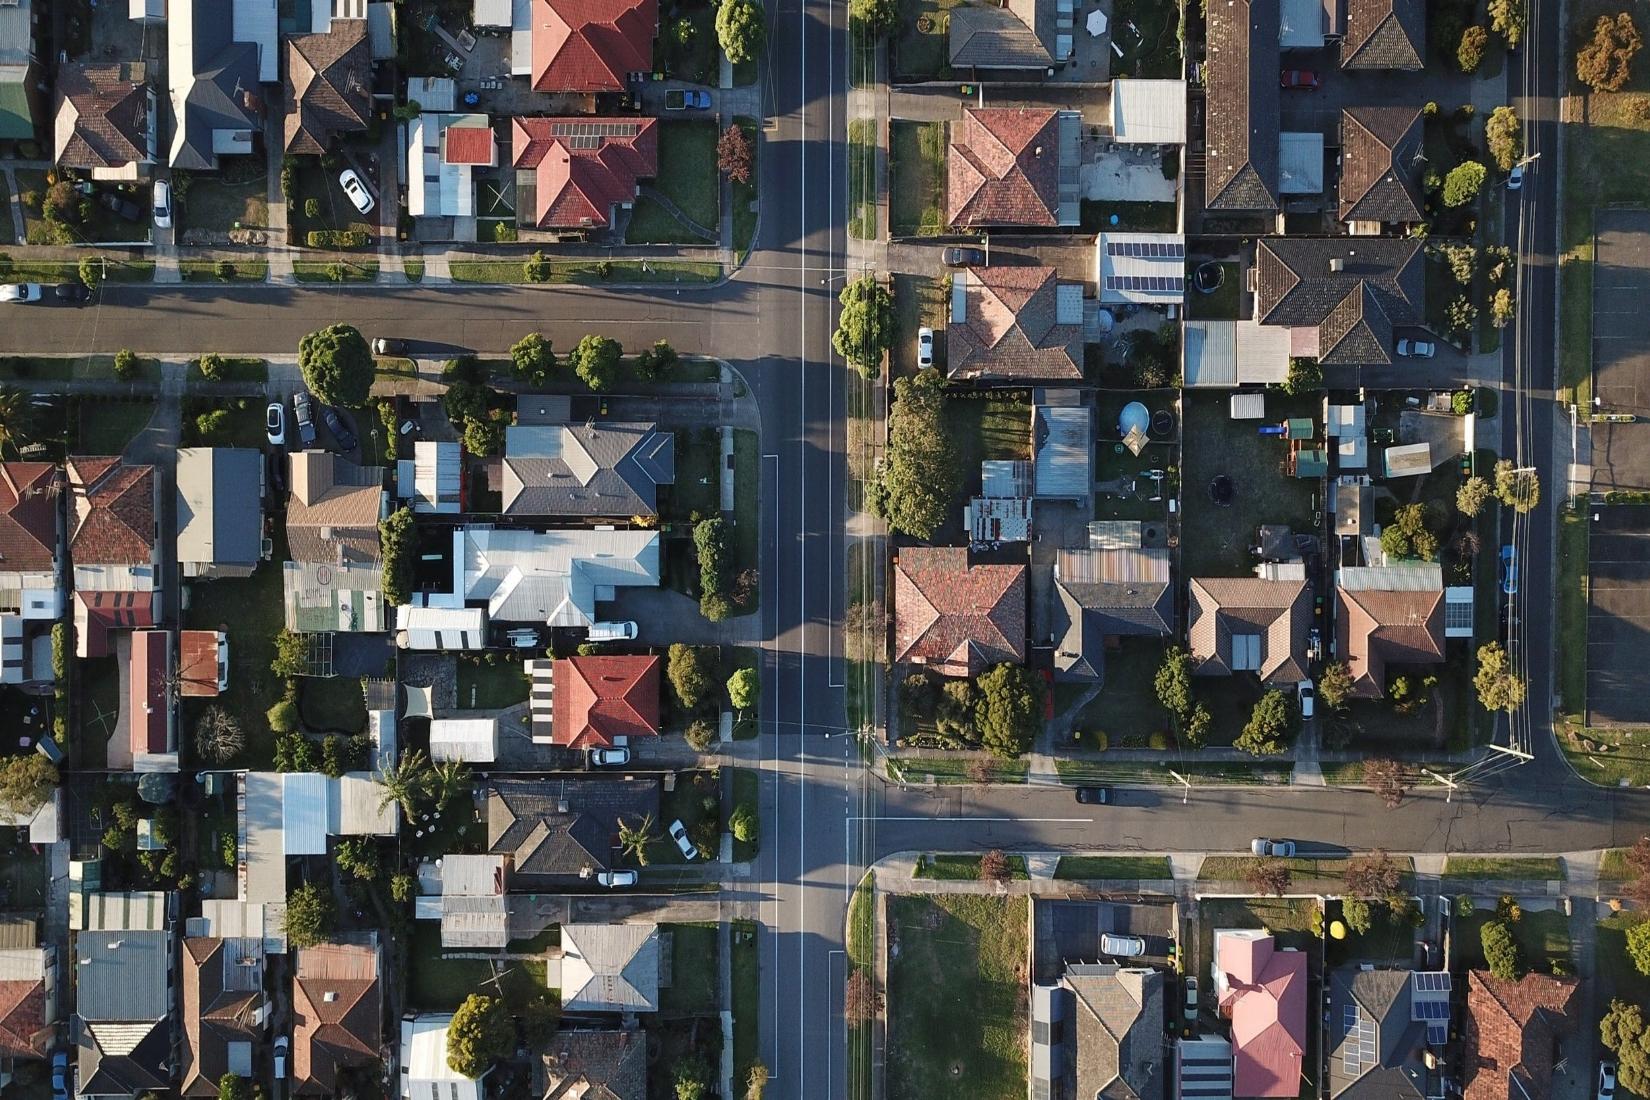 Rizzo-Young-Marketing-LLC-Real-Estate-Title-Company-Housing-Urban-Development-Closings.jpg